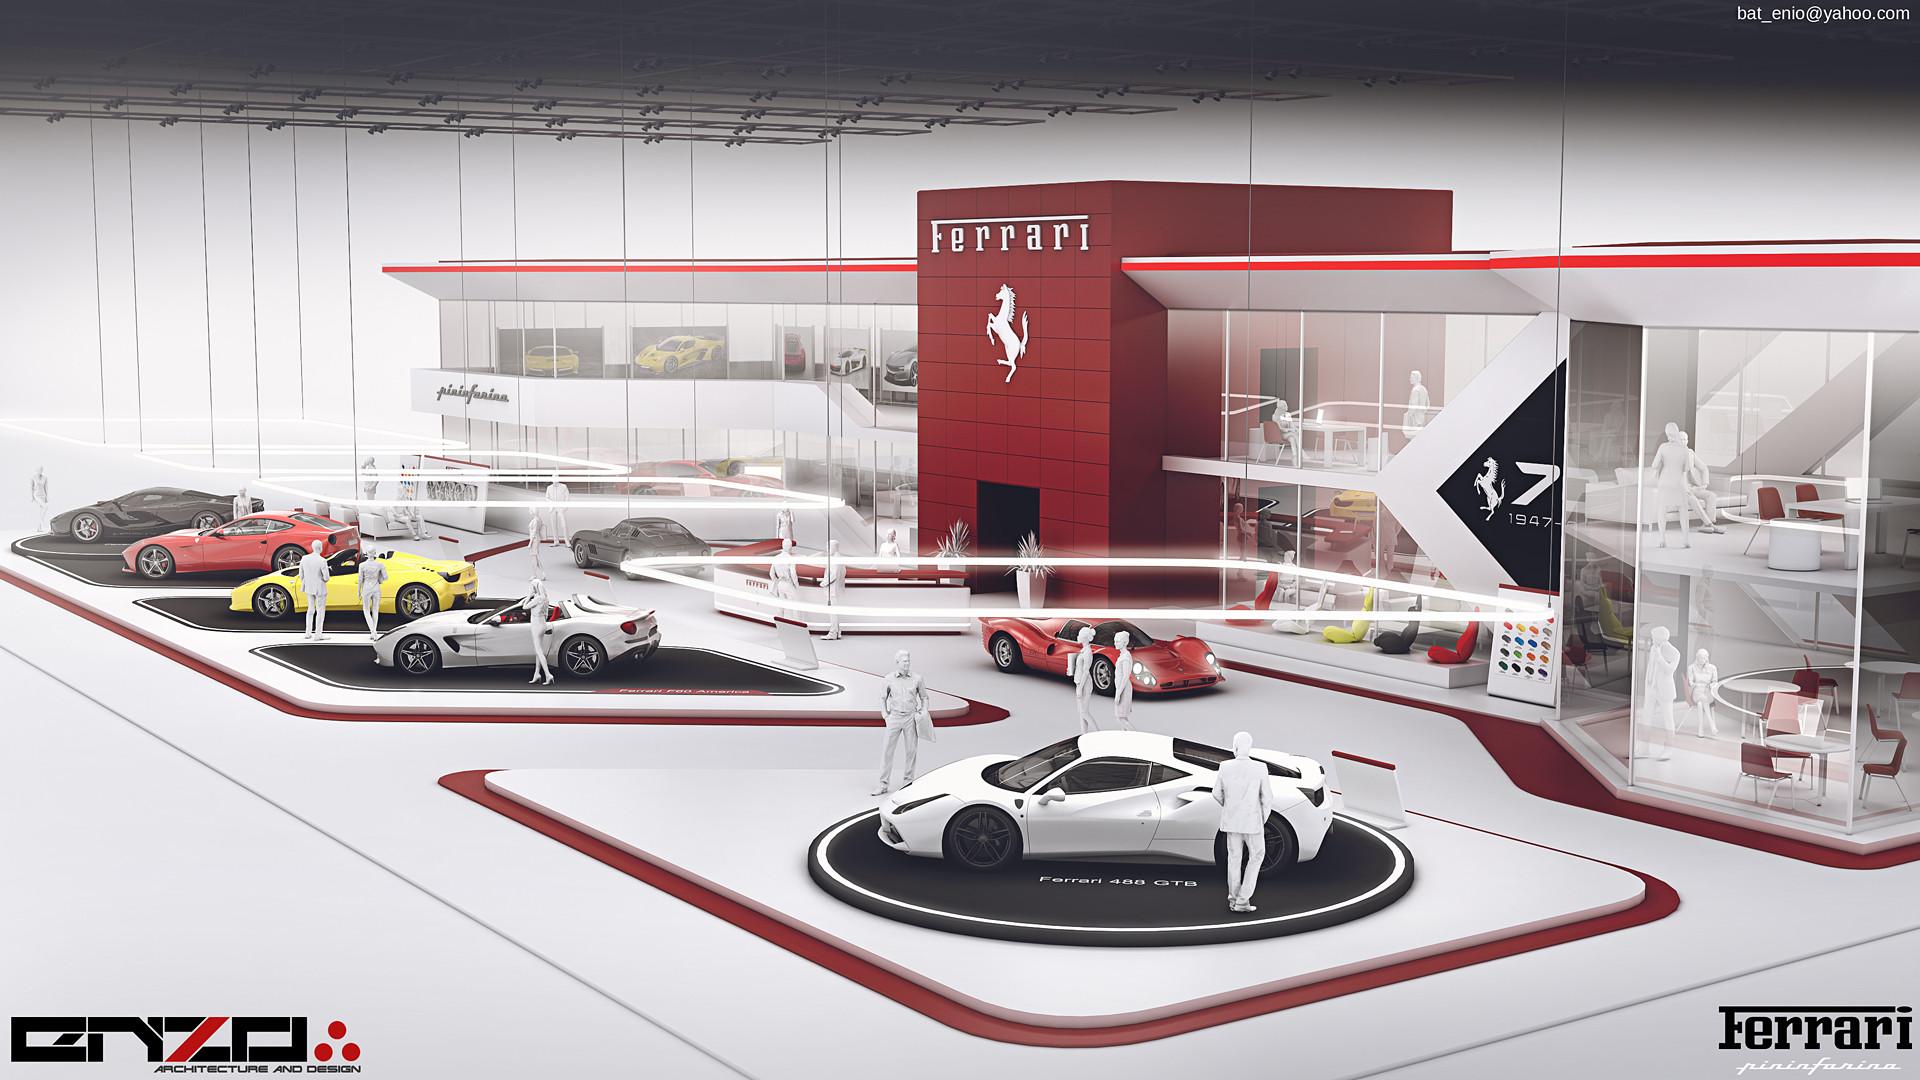 Car Expo Standsay : Artstation ferrari expo stand concept encho enchev